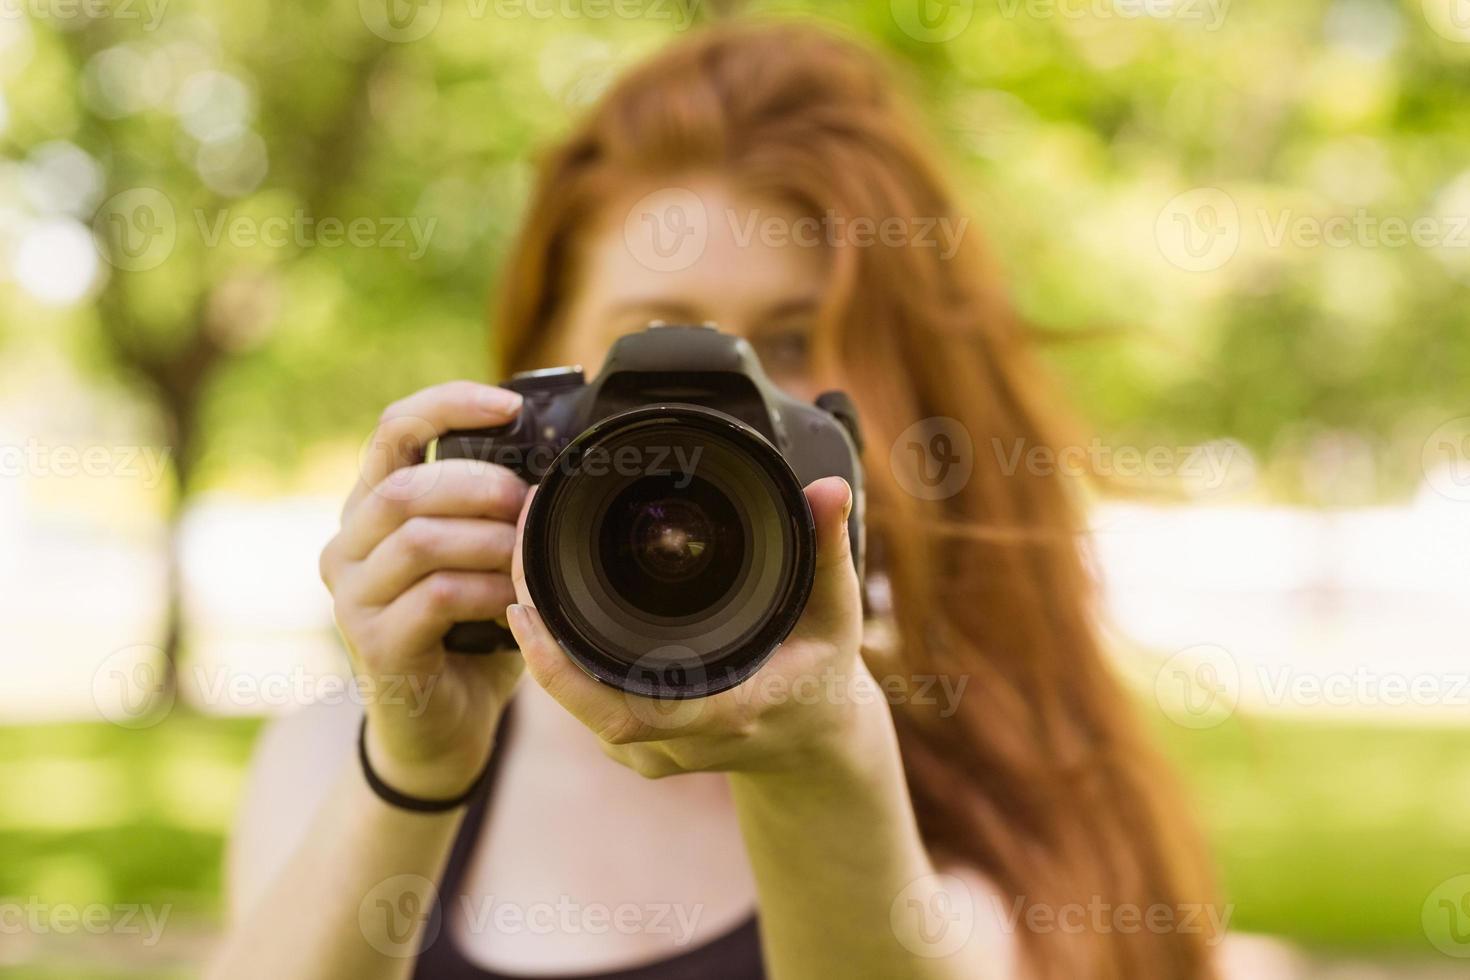 fotógrafo feminino no parque foto